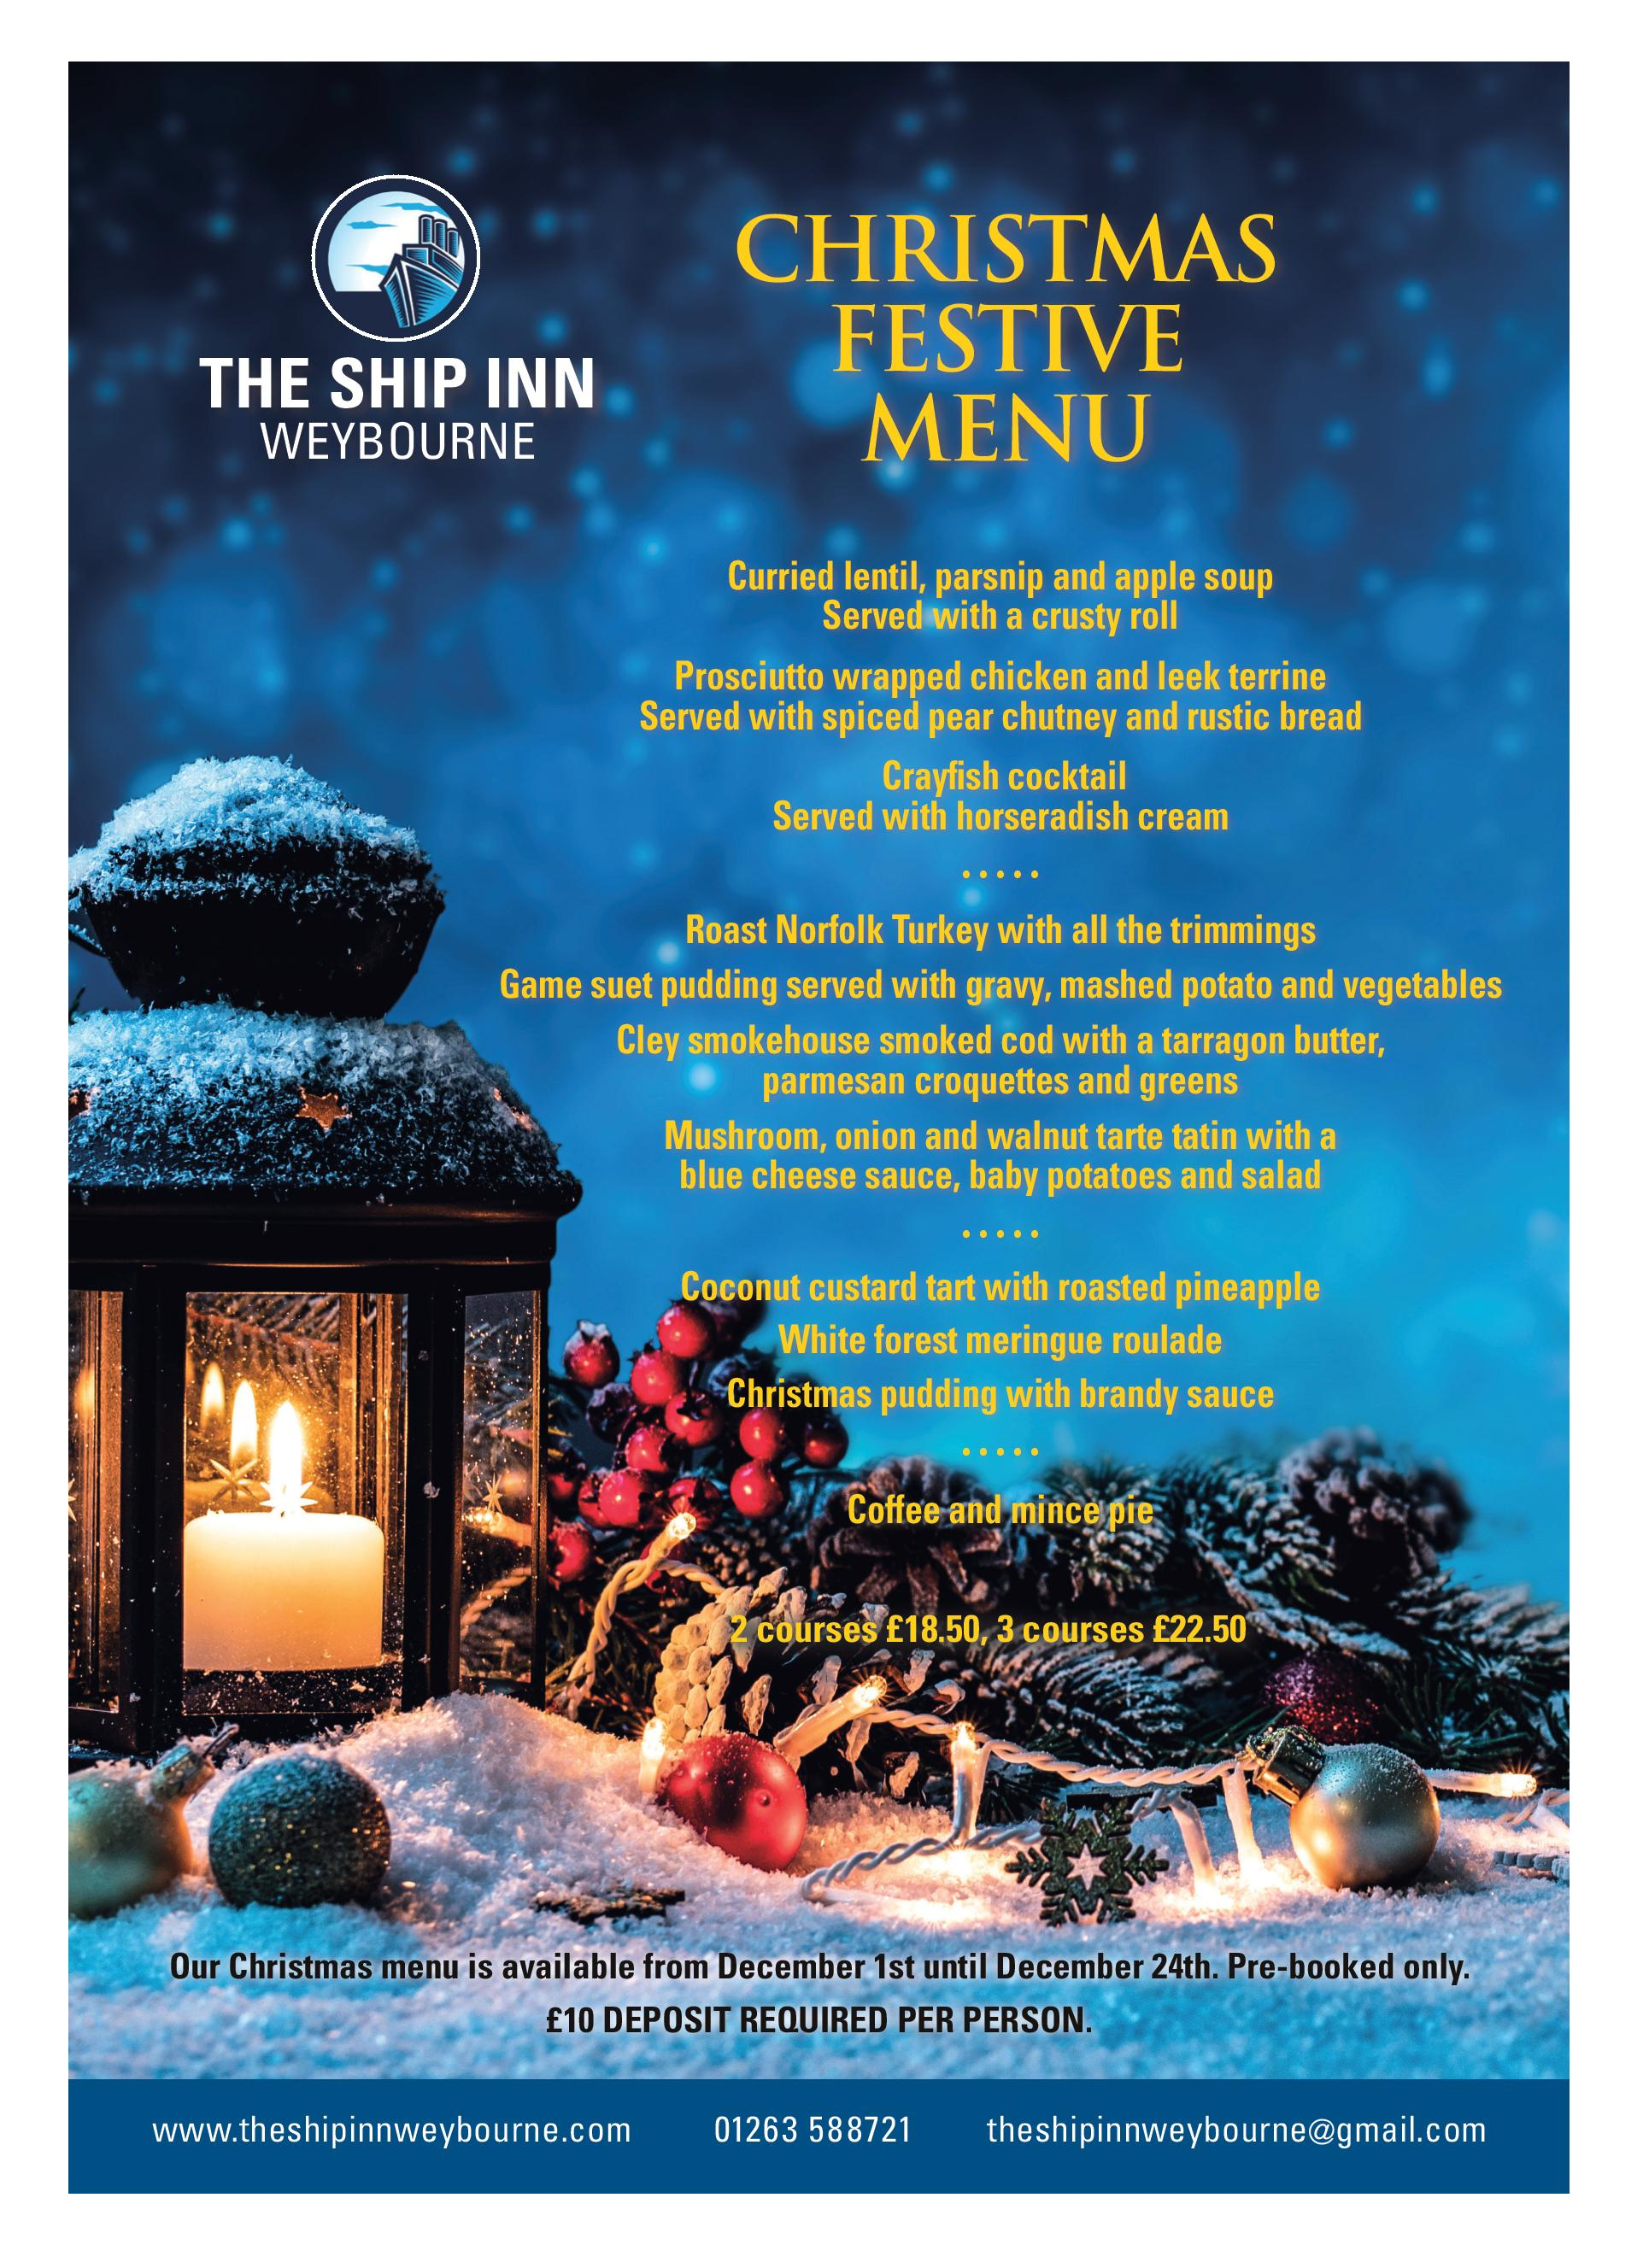 Christmas festive menu 2019-page-001.jpg